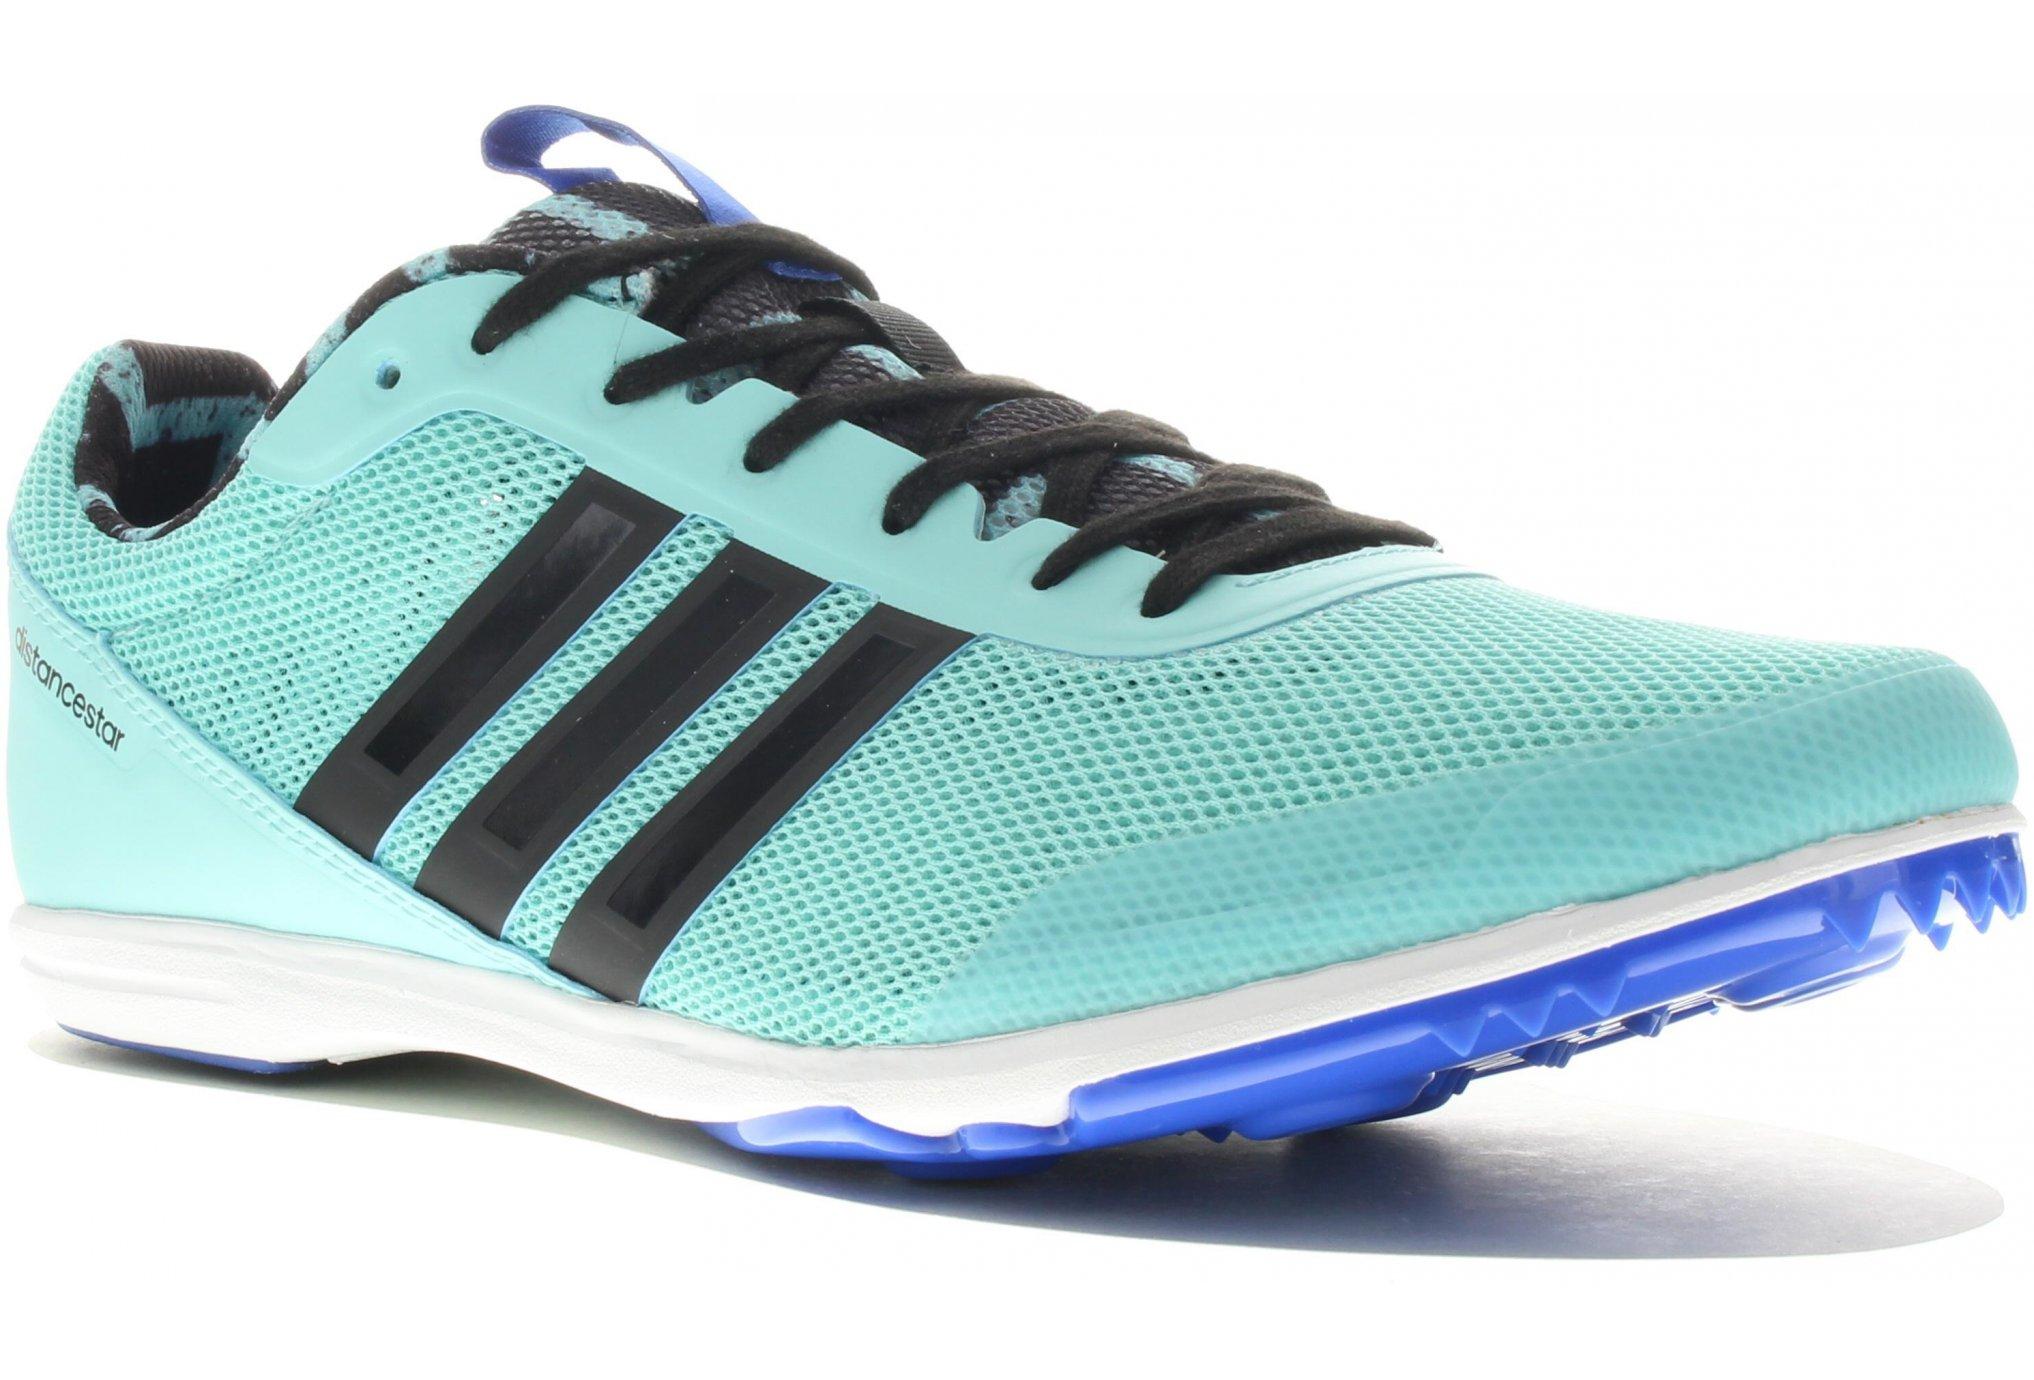 Adidas Distancestar w diététique chaussures femme